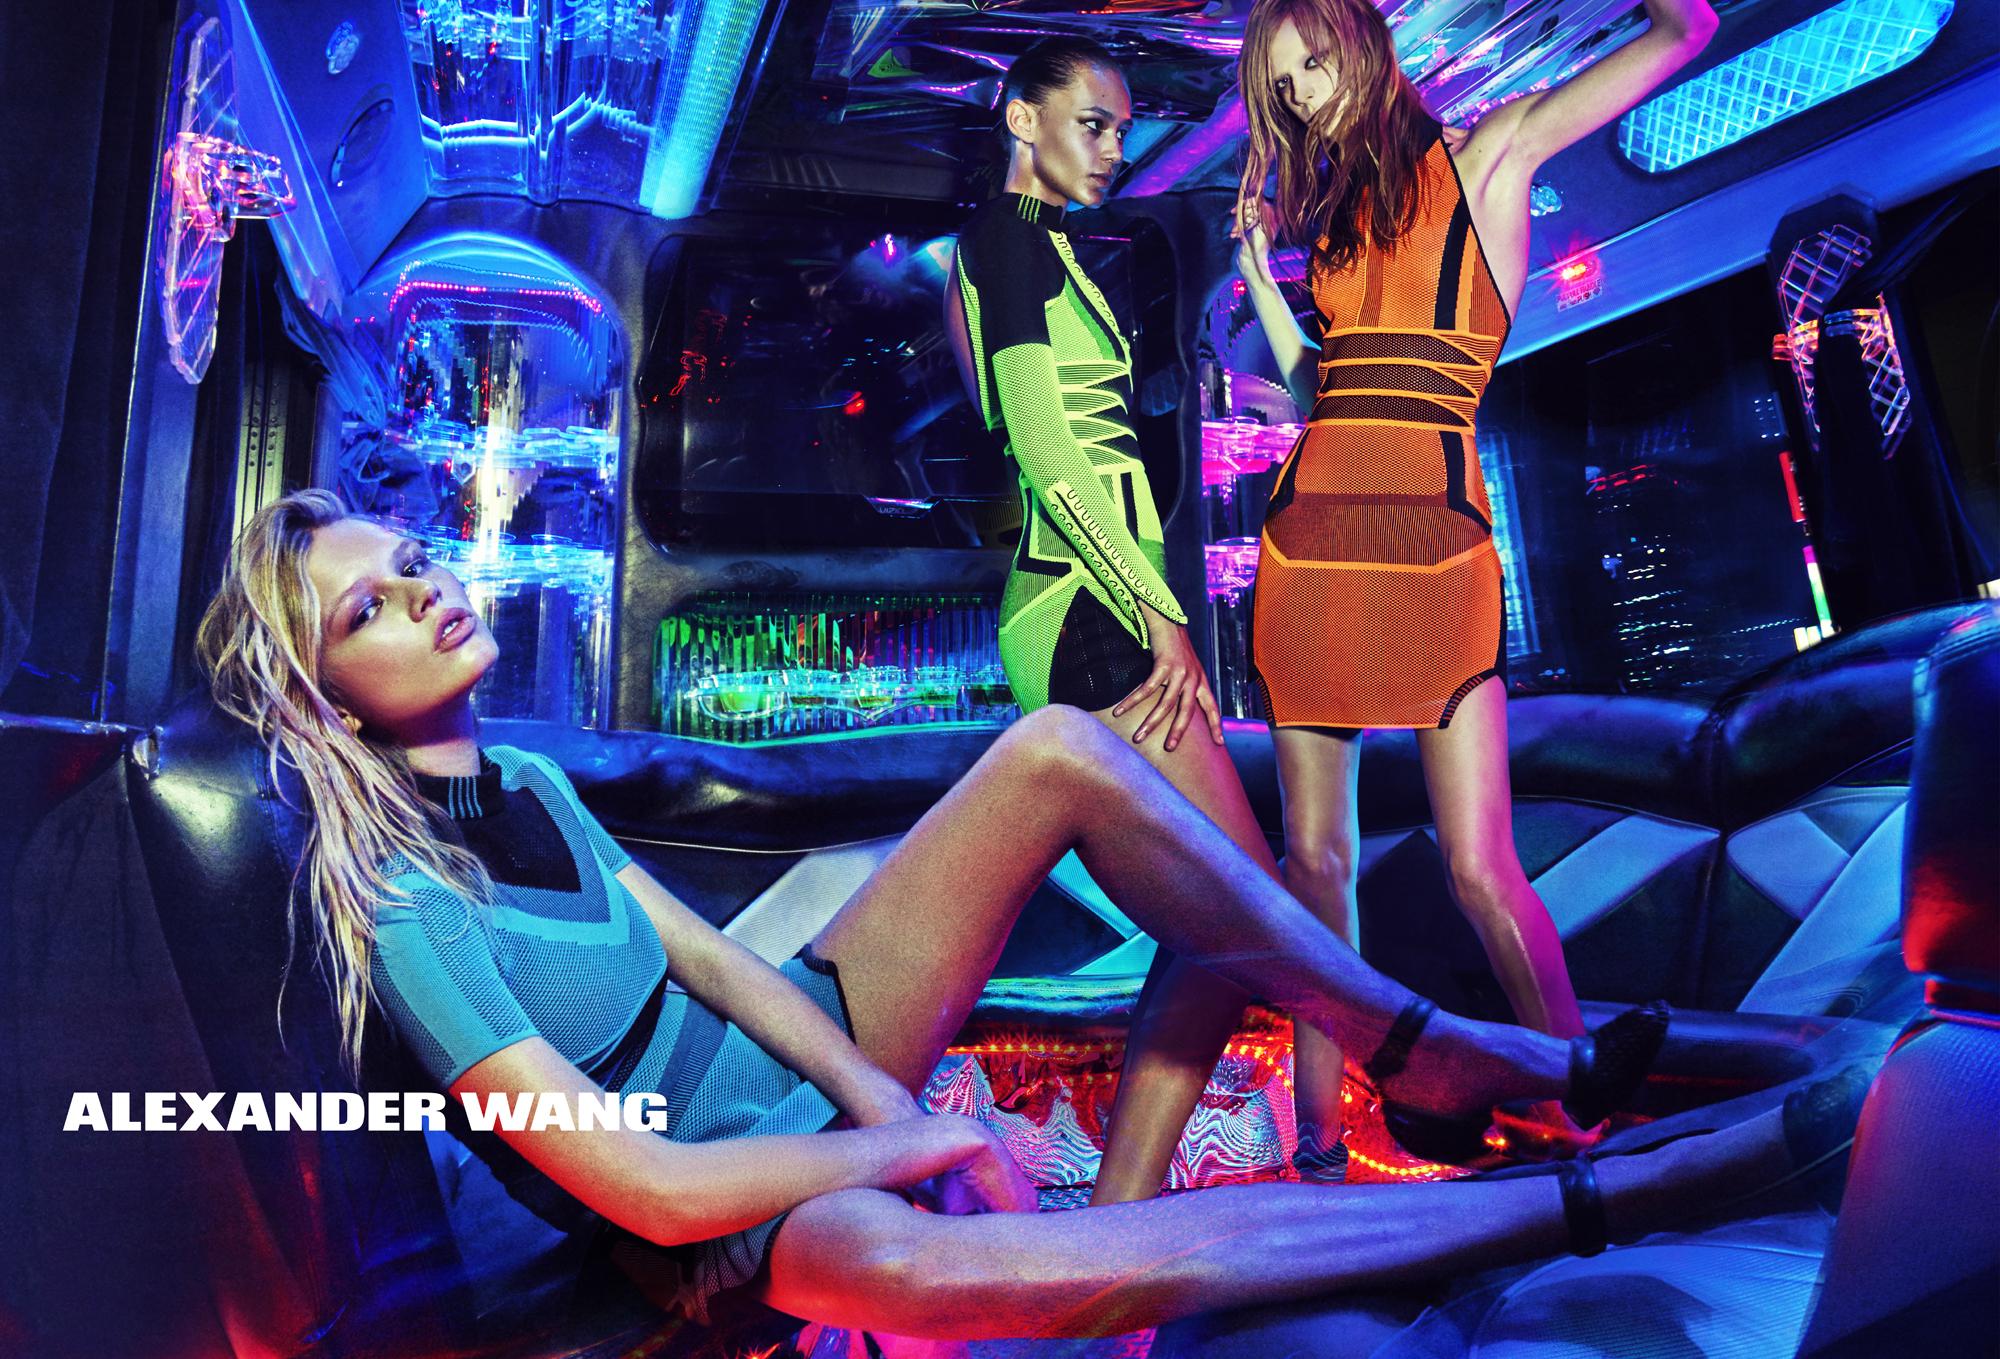 alexander-wang-spring-2015-ad-campaign-02